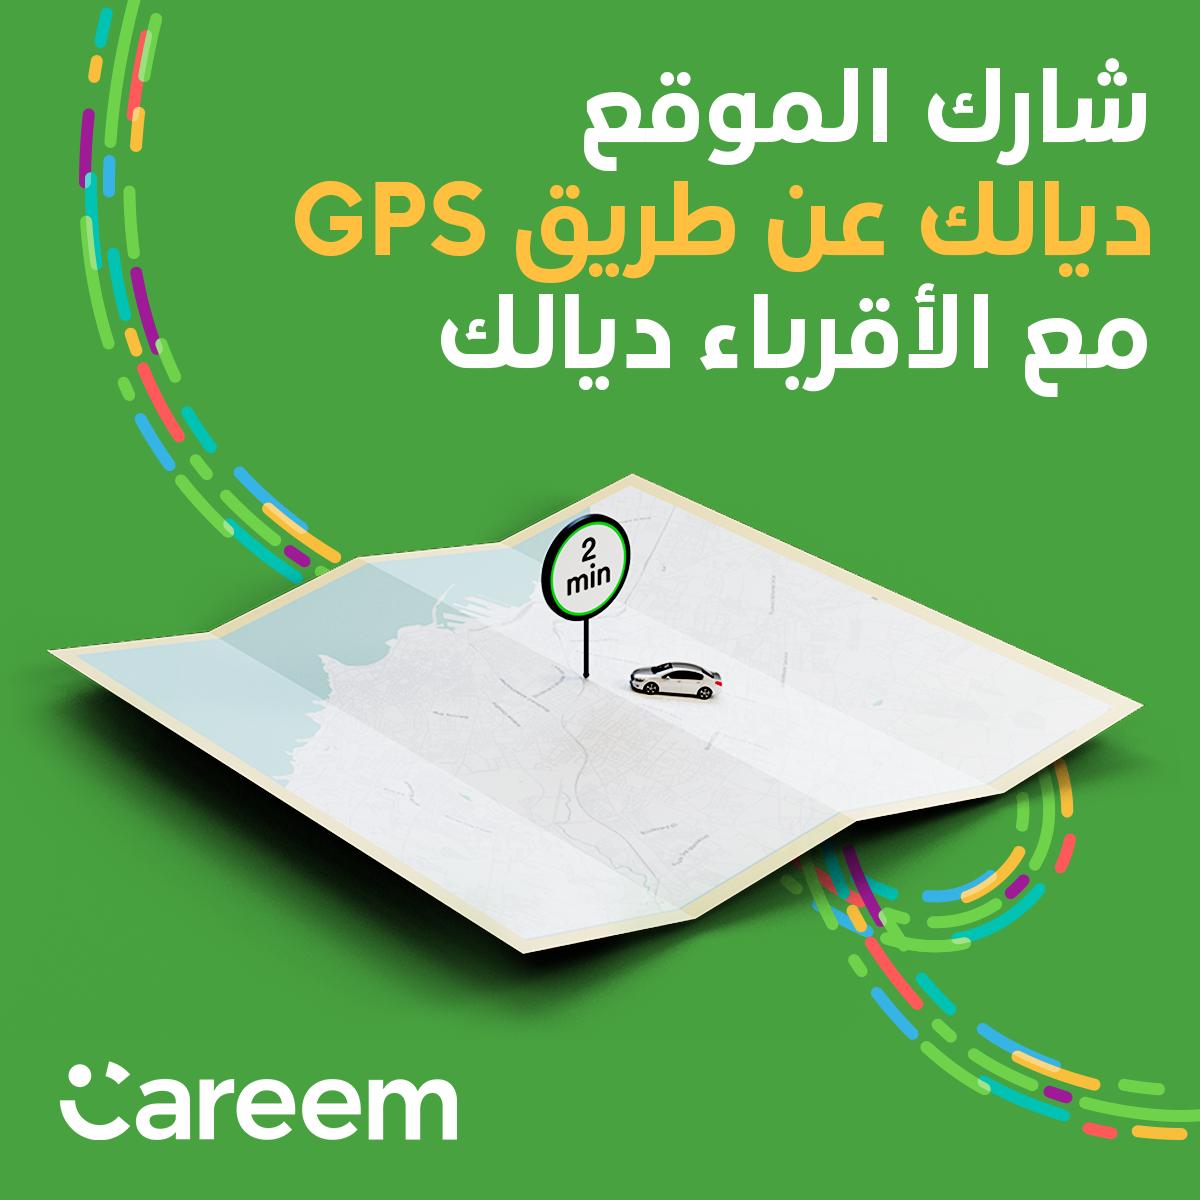 Careem-16